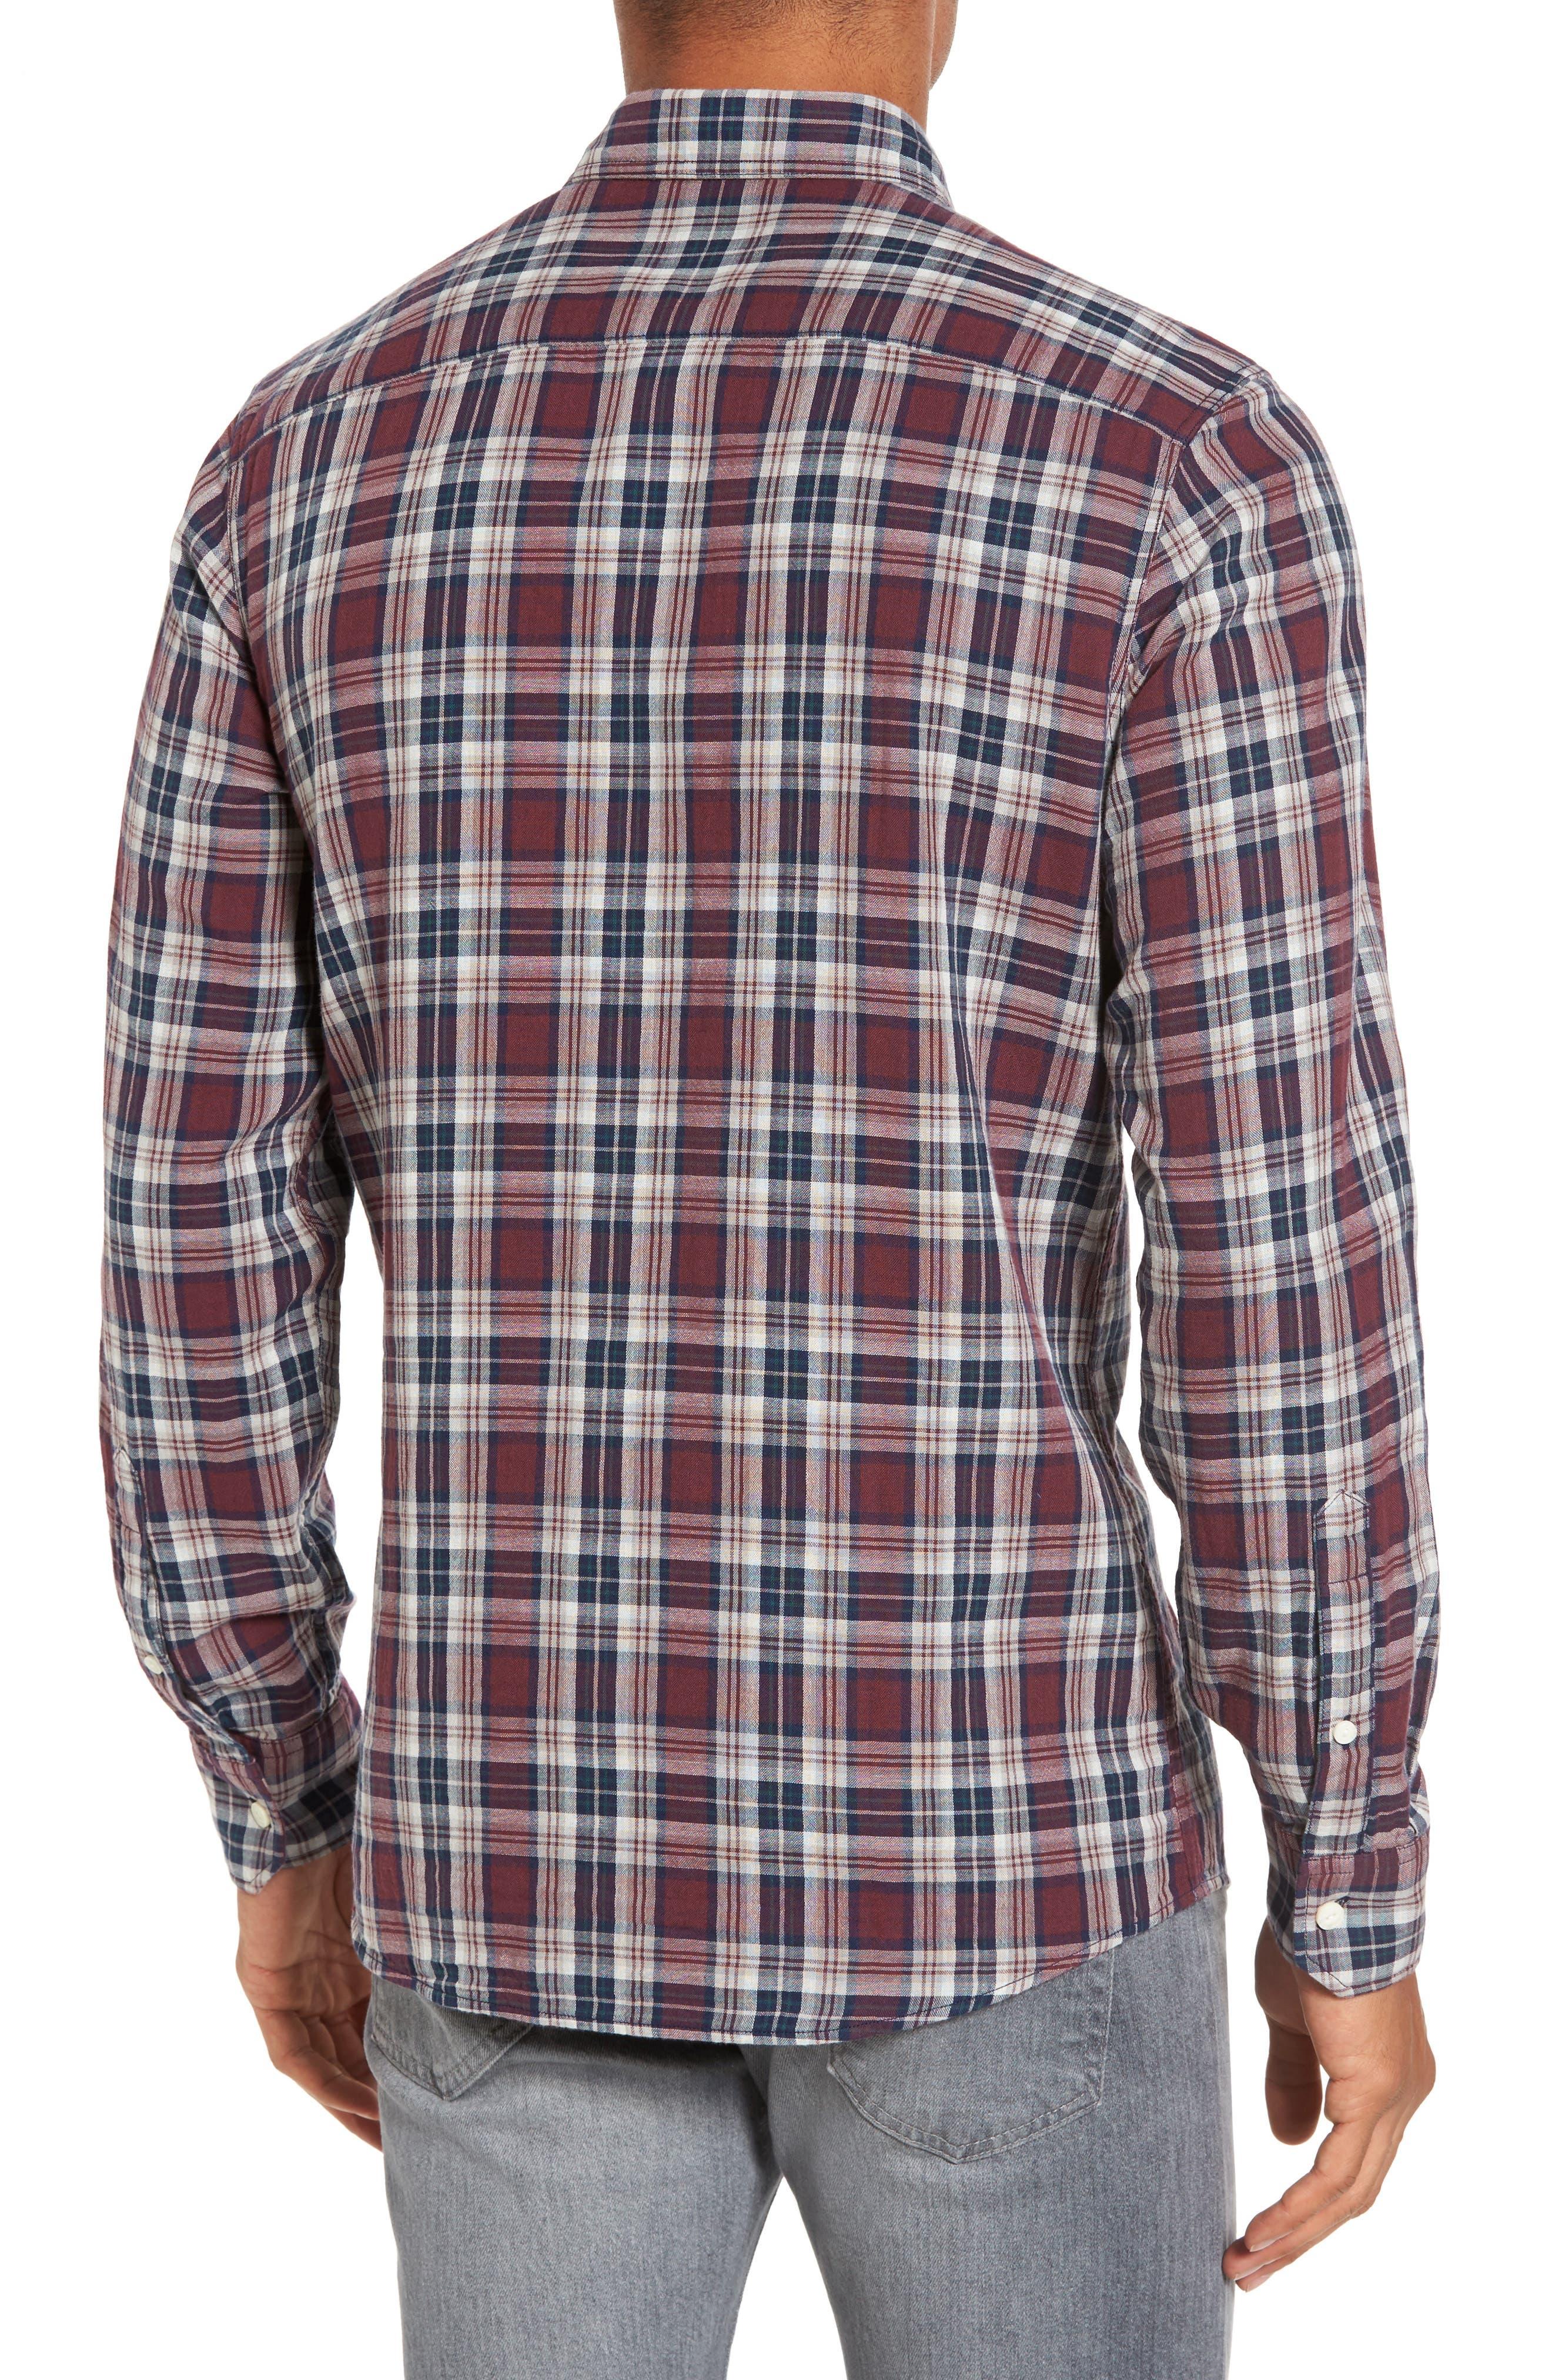 Lumber Duofold Slim Fit Plaid Shirt,                             Alternate thumbnail 2, color,                             938